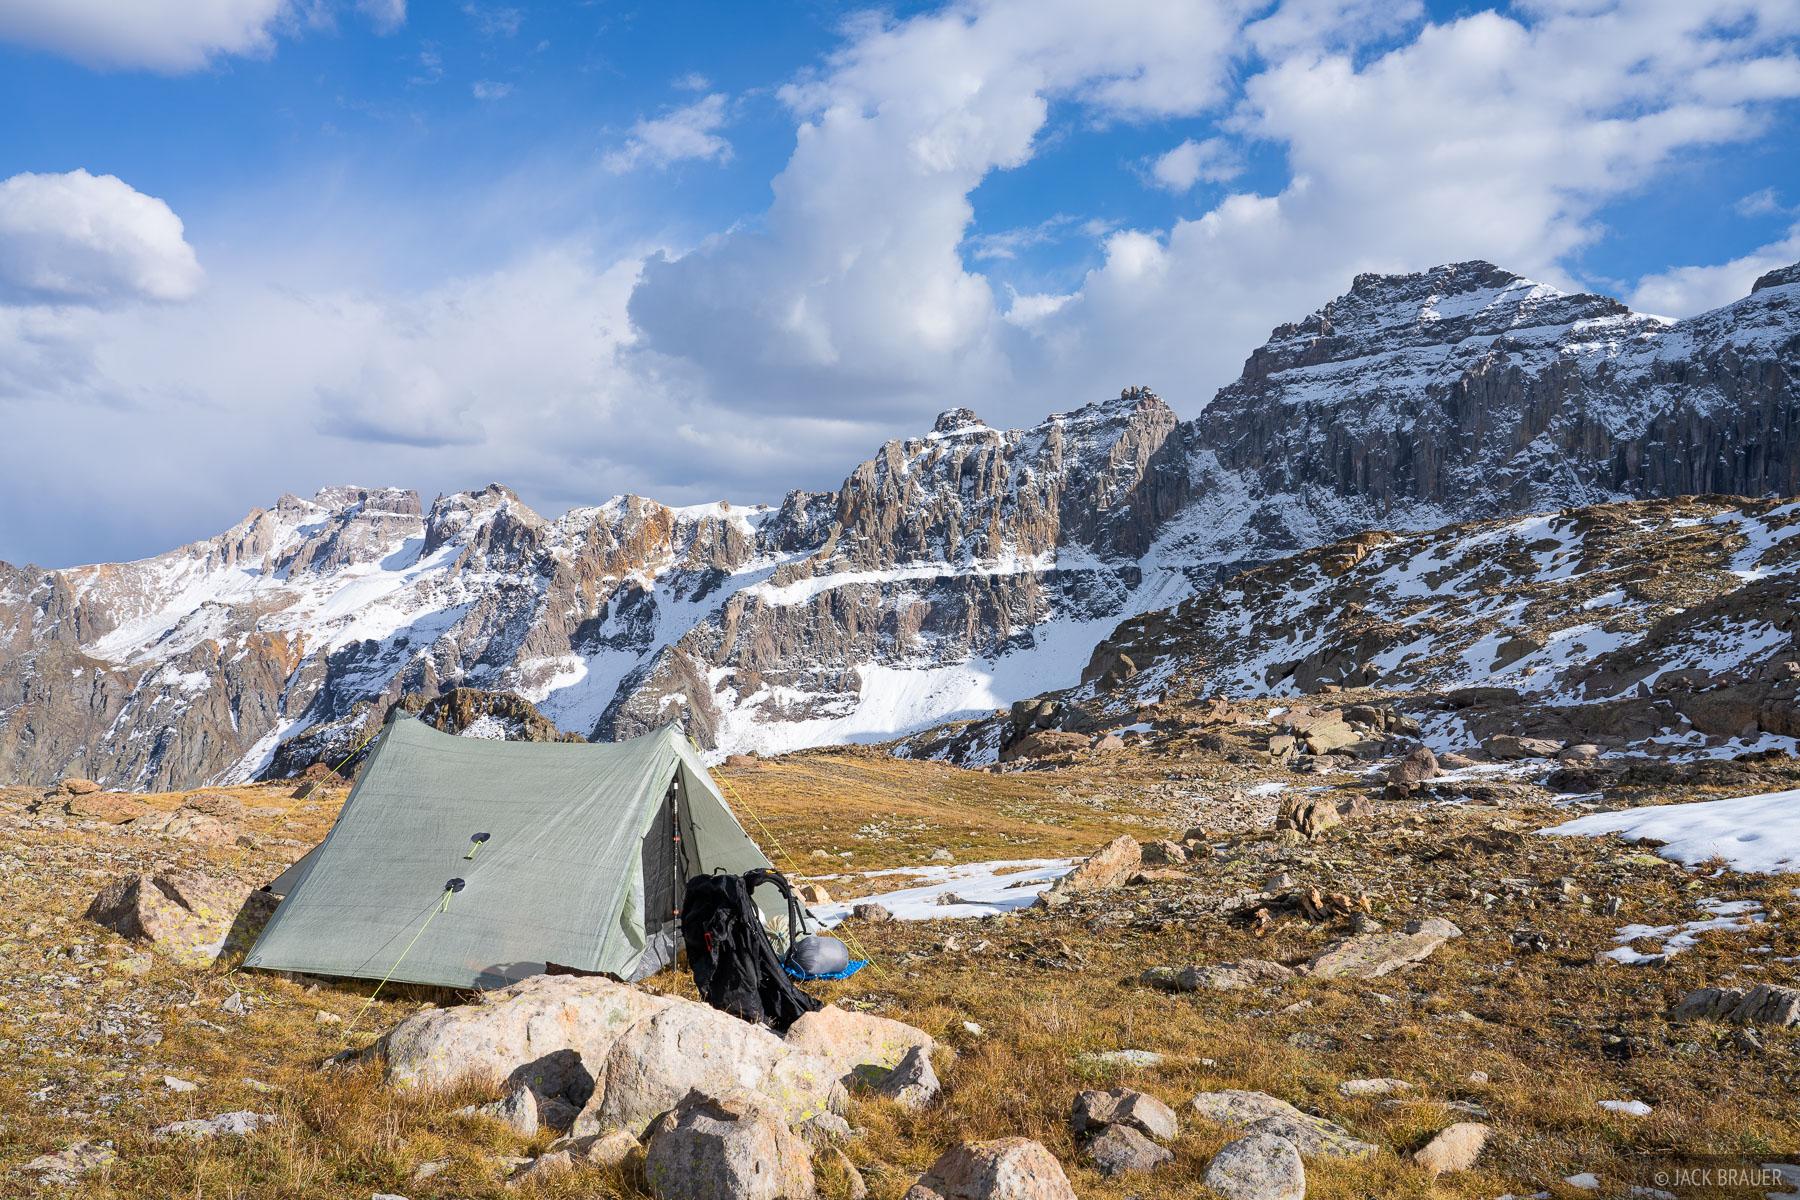 Colorado, Dallas Peak, San Juan Mountains, Sneffels Range, tent, photo